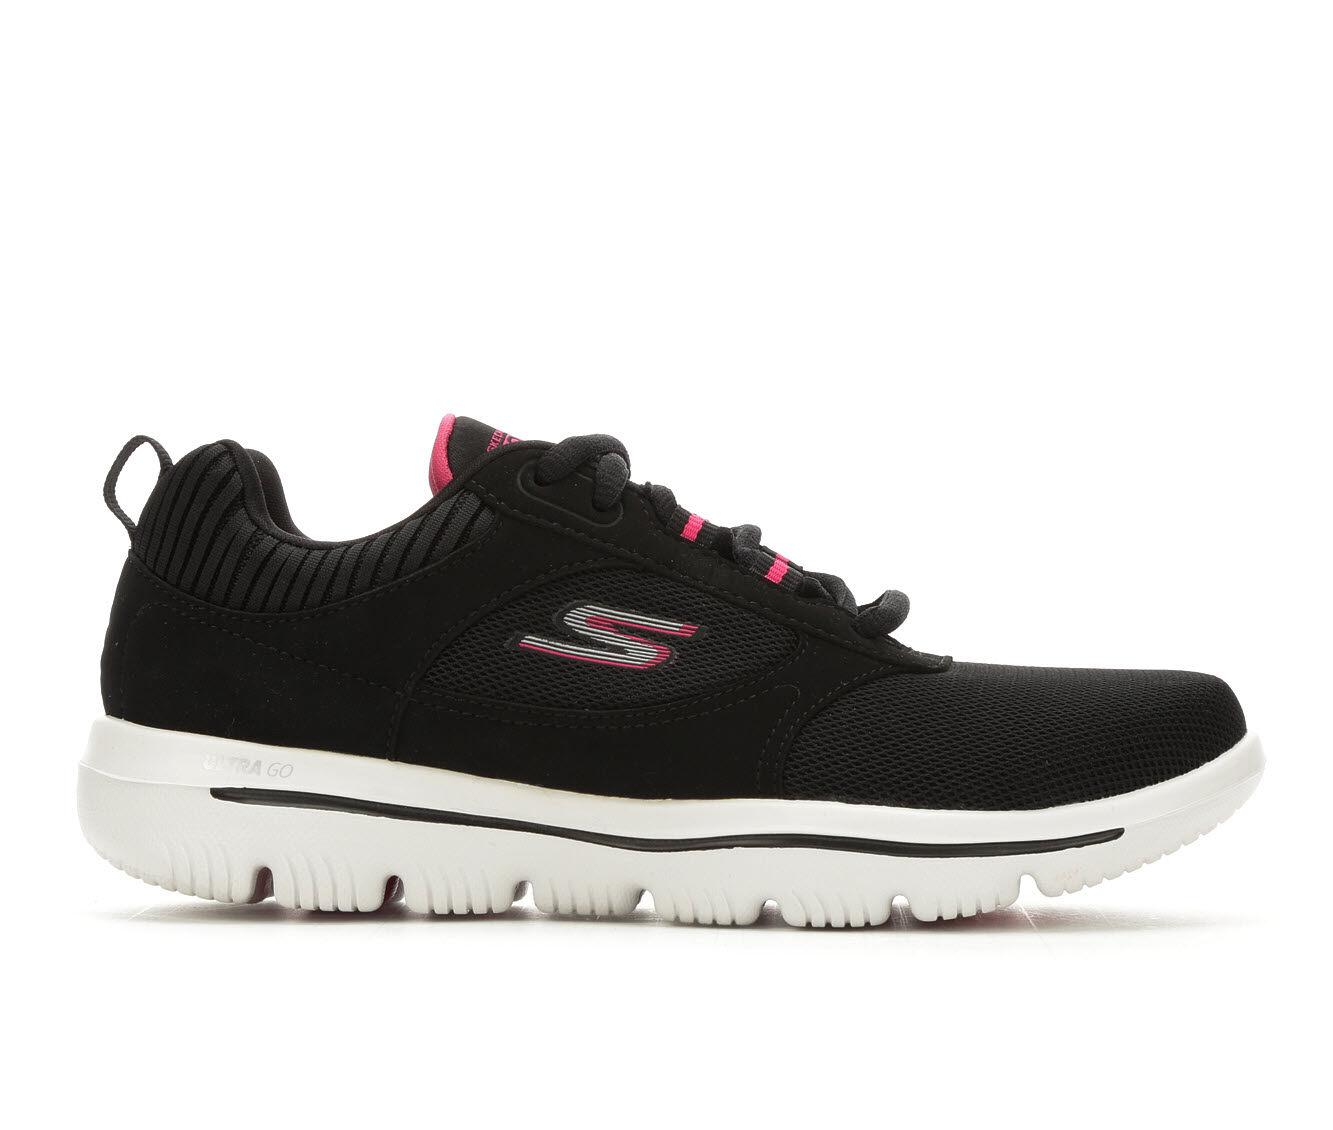 summer hot sale Women's Skechers Go Evolution Enhace 15734 Walking Shoes Black/Pink